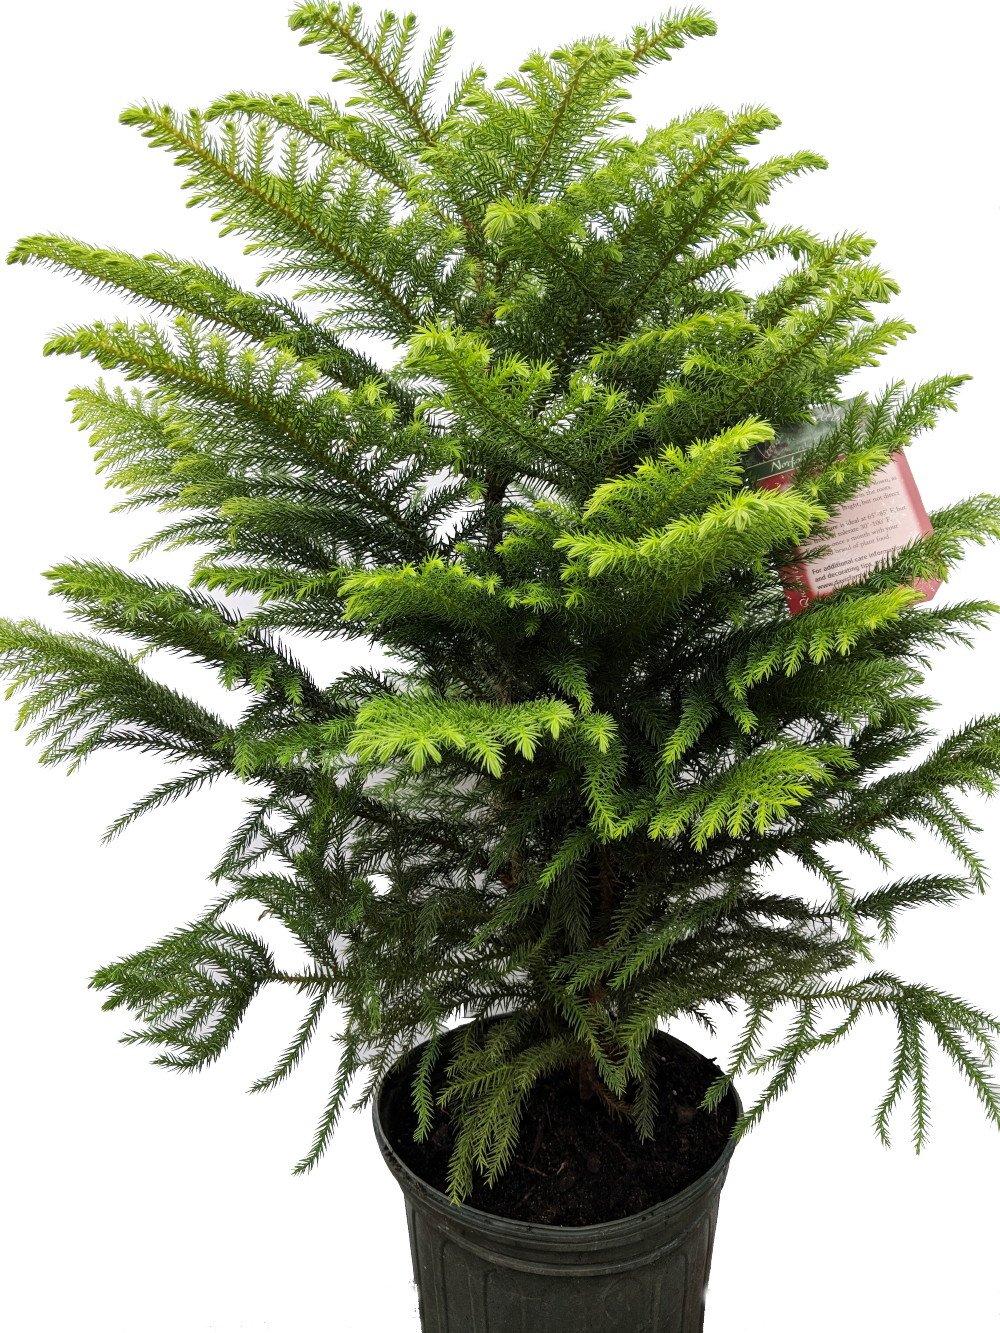 Norfolk Island Pine - The Indoor Christmas Tree - 8'' Pot - 20-24 Tall